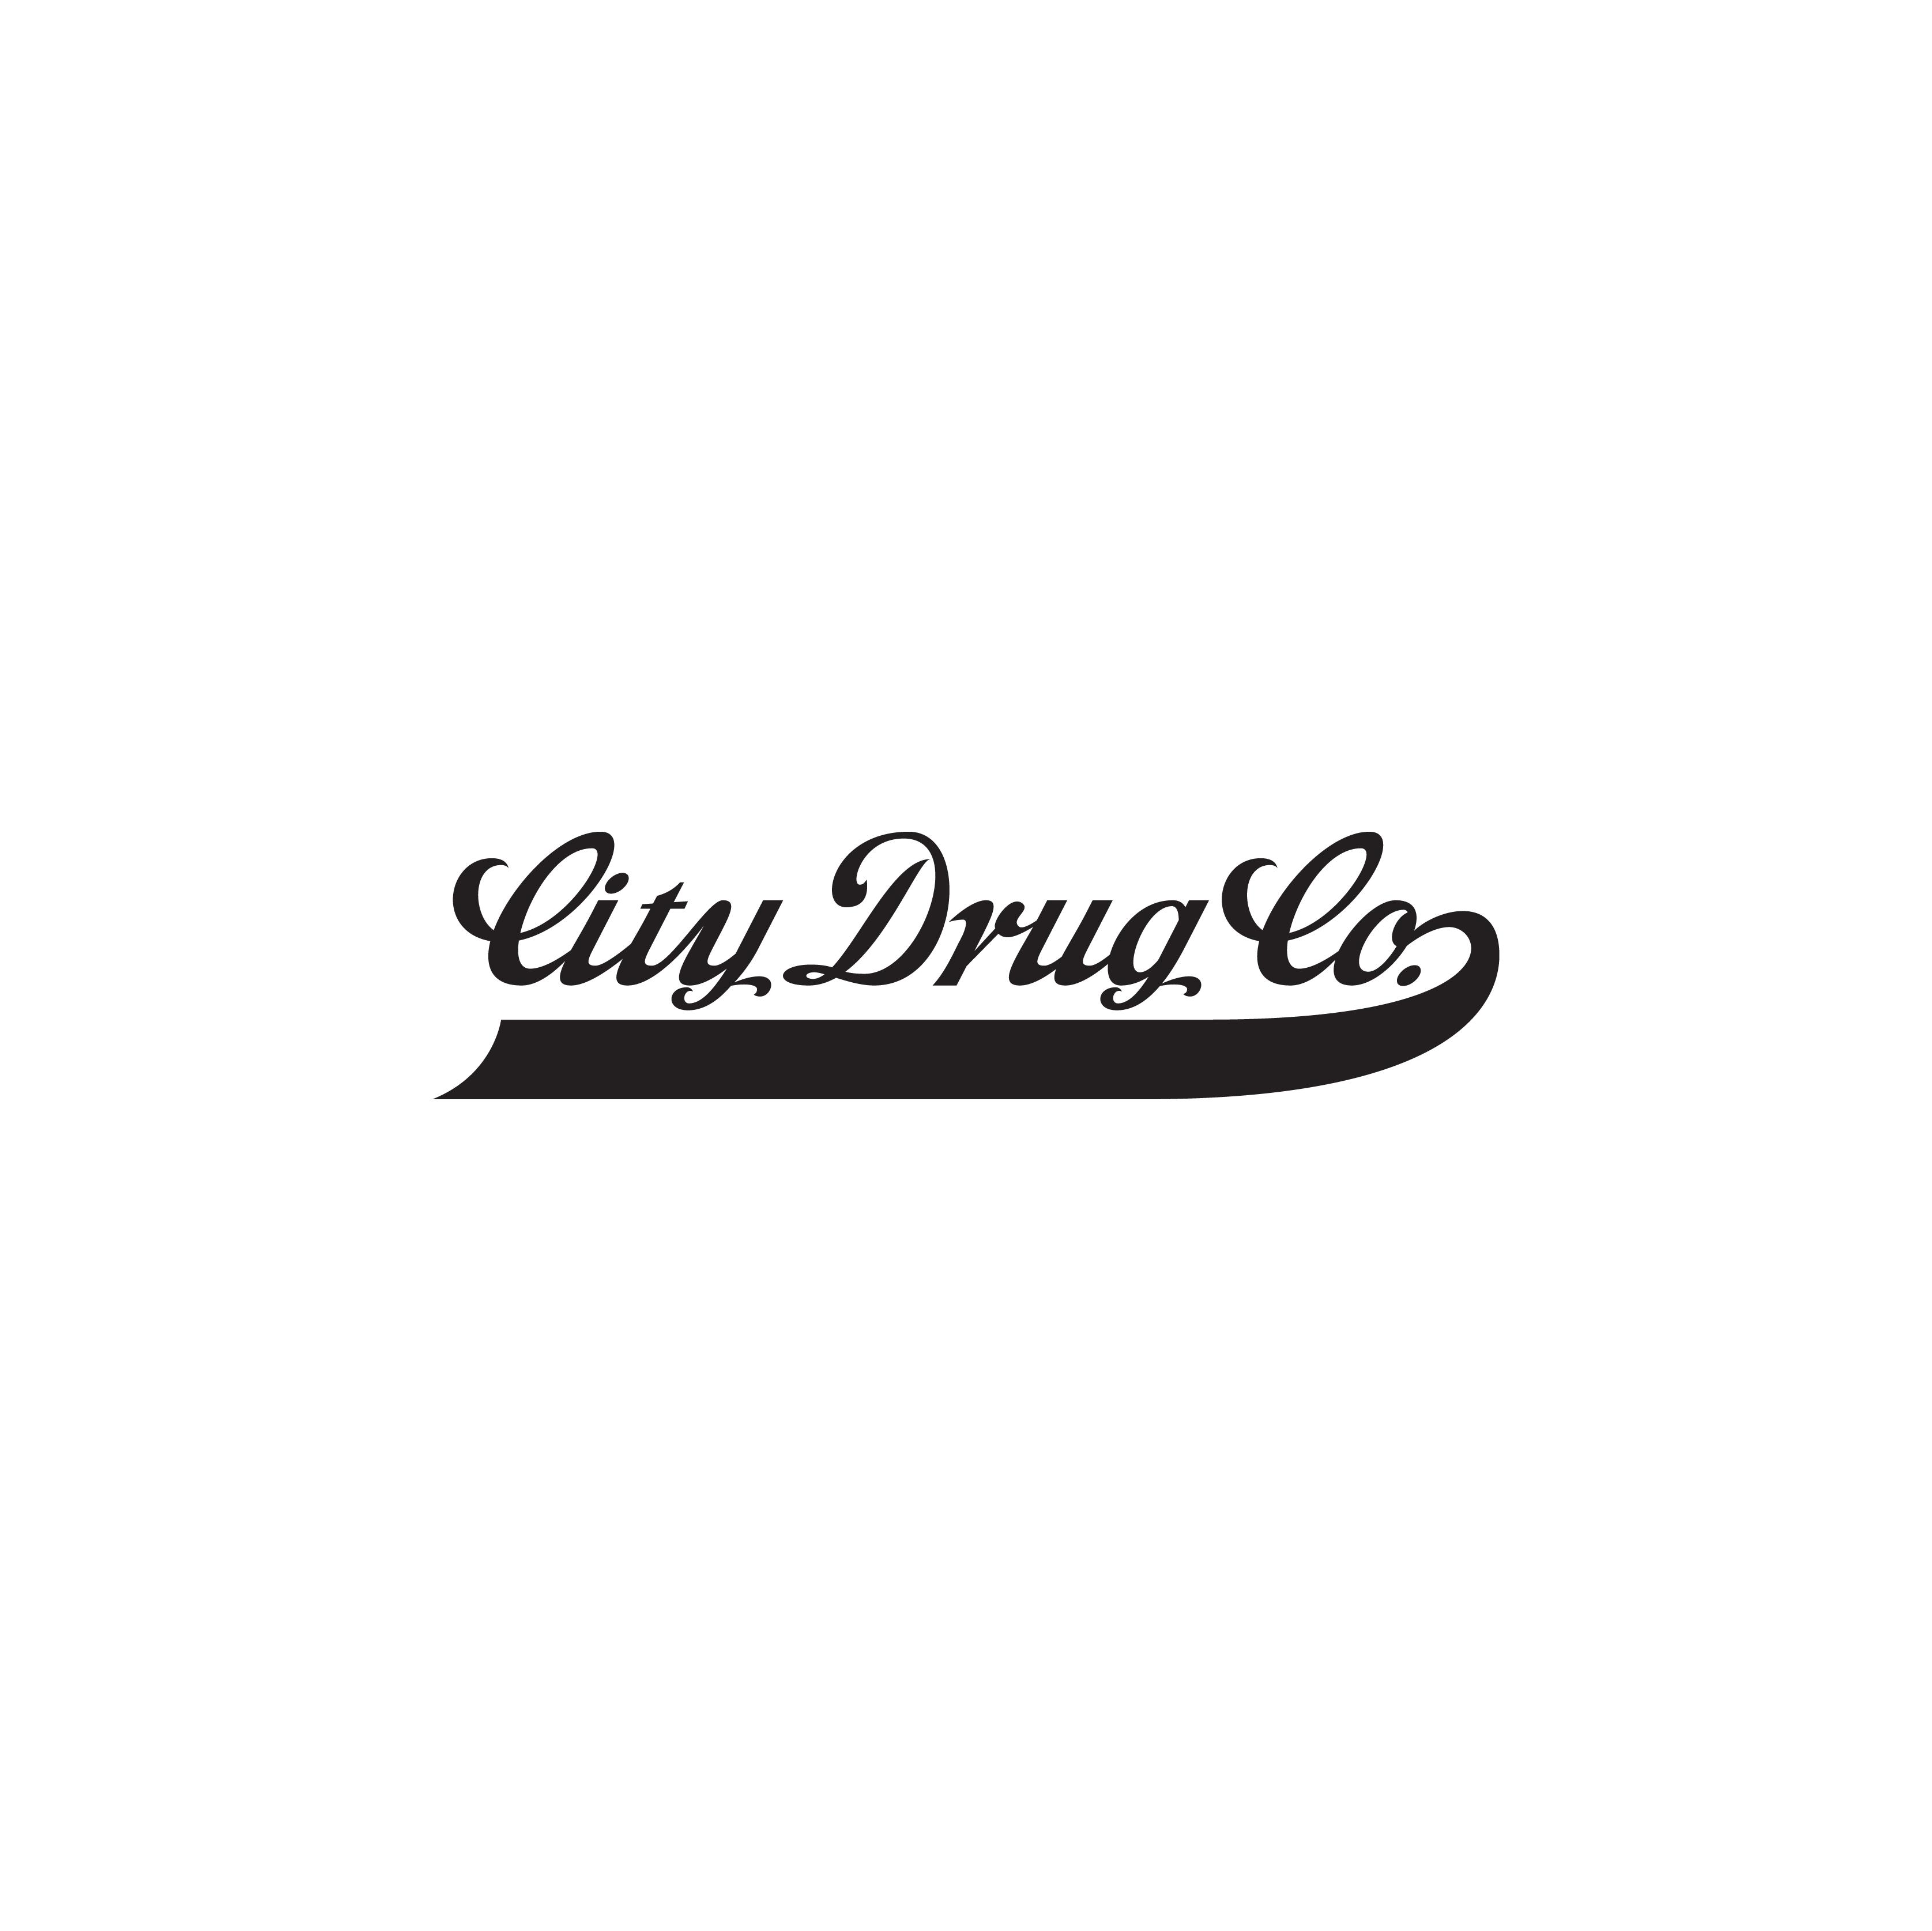 City Drug logo design by logo designer Always Abounding